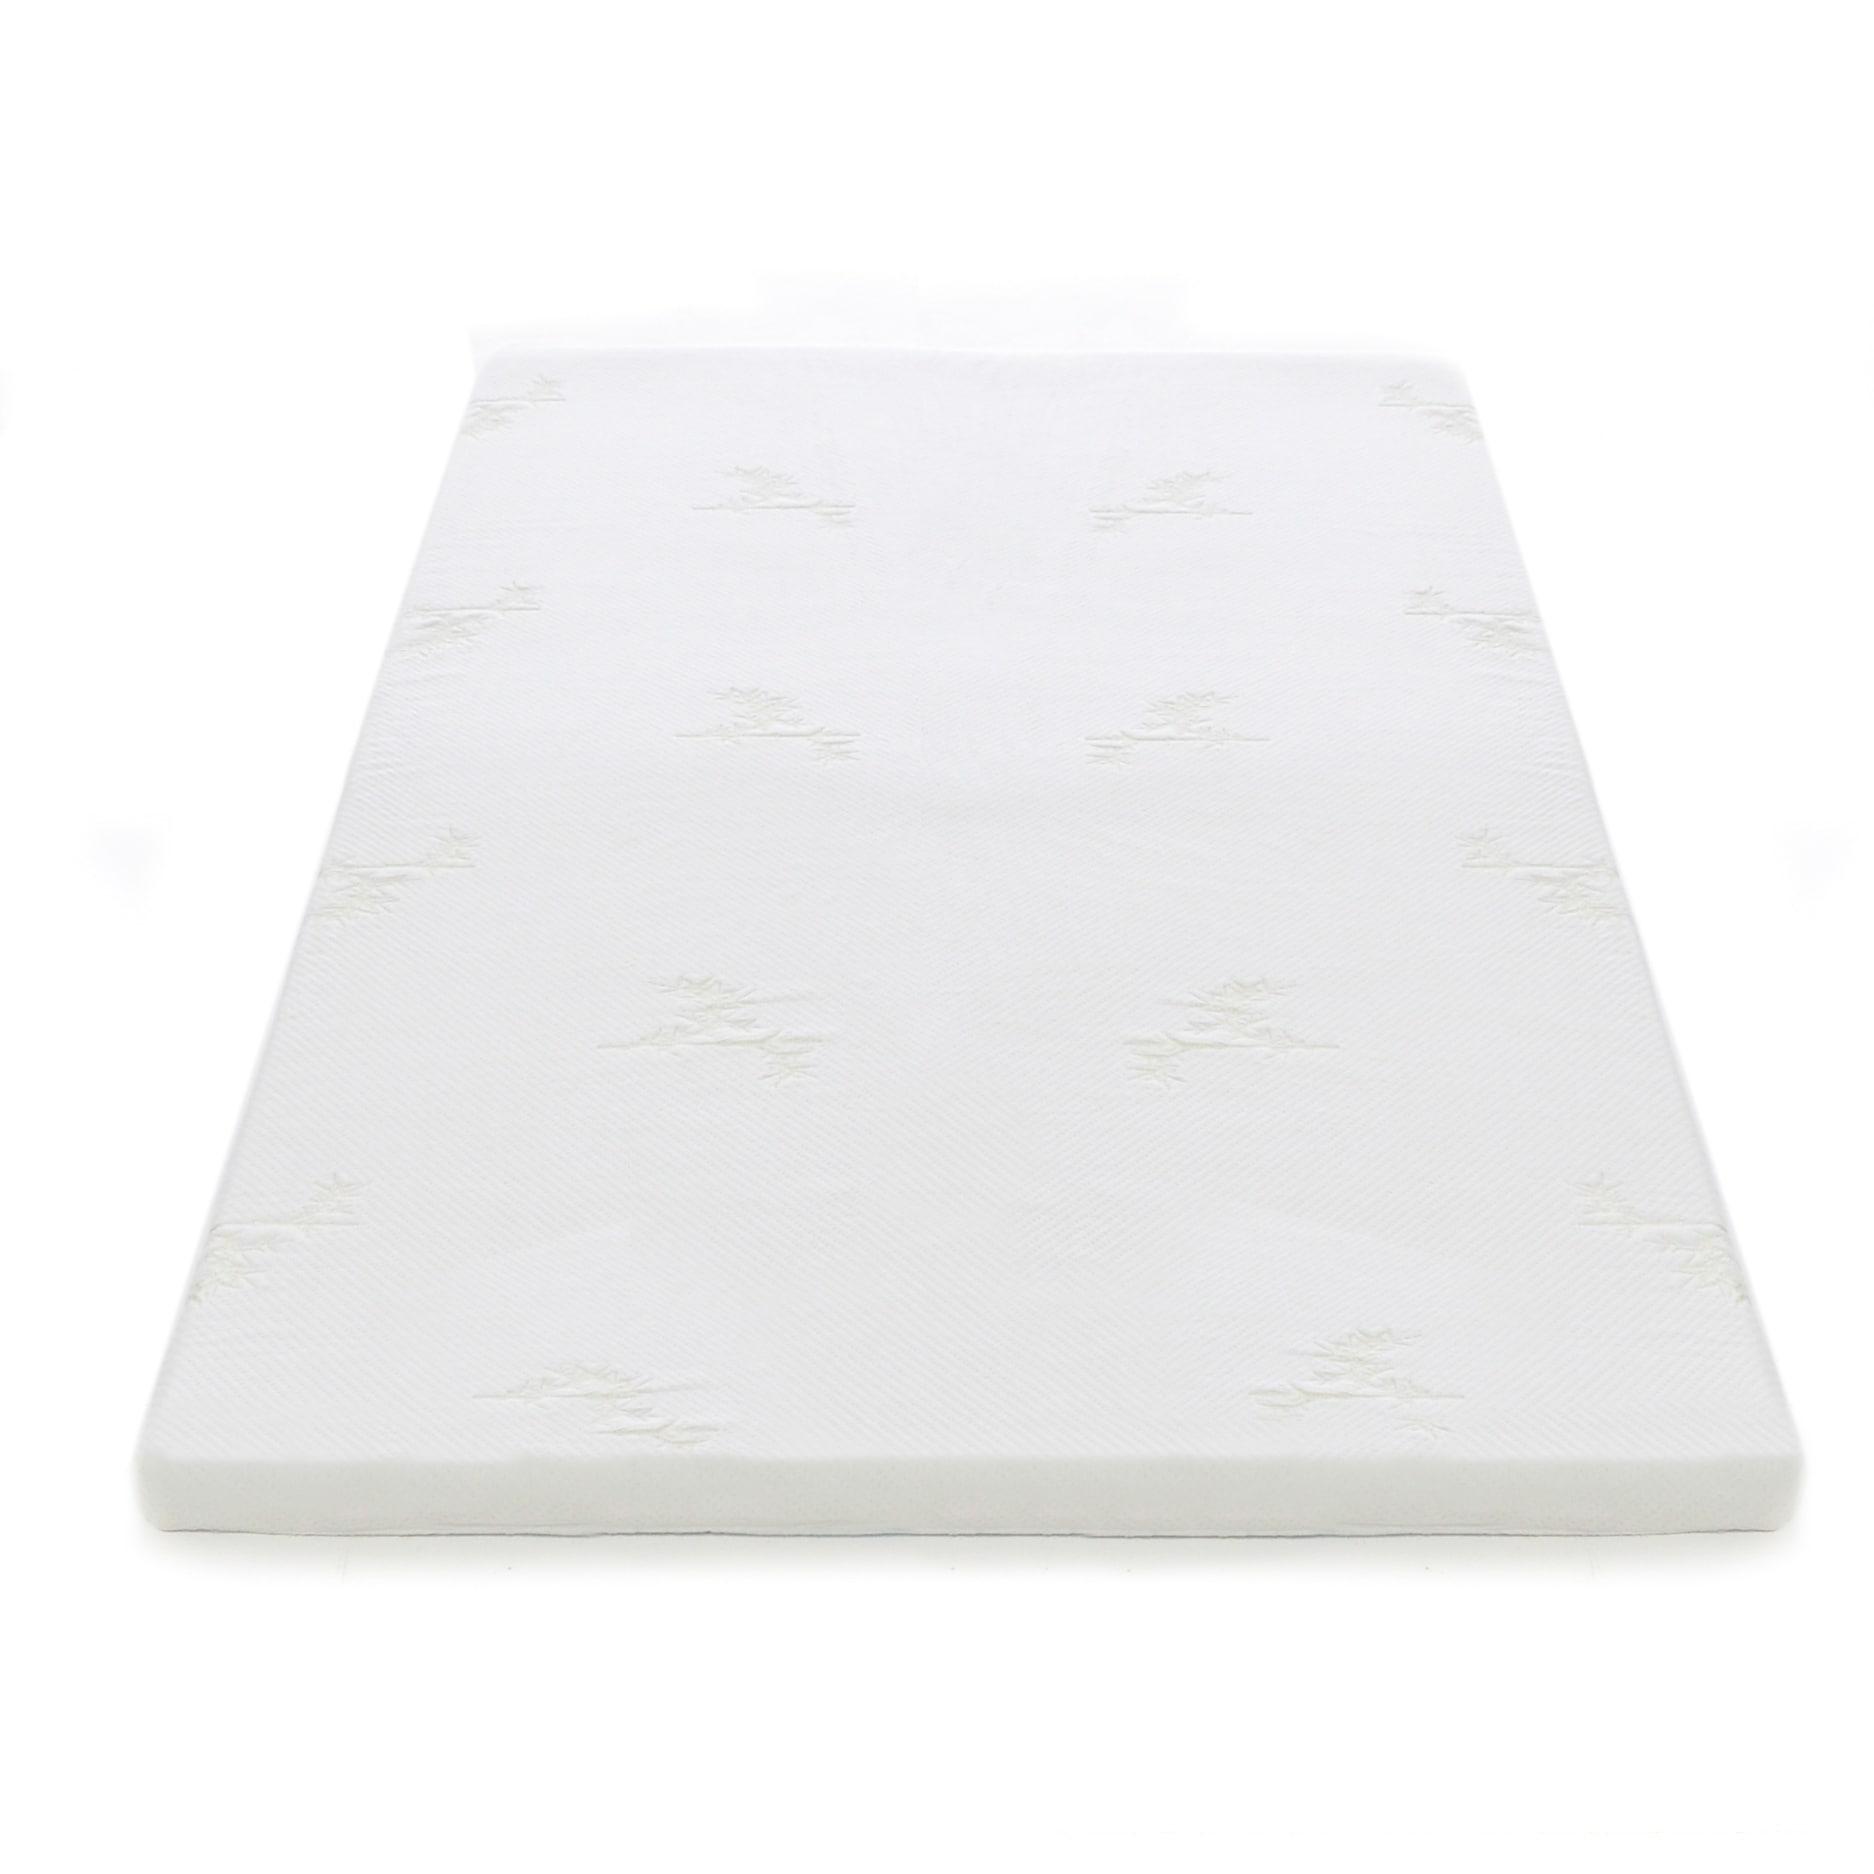 Shop Milliard 2 Inch Gel Memory Foam Mattress Topper With Cover On